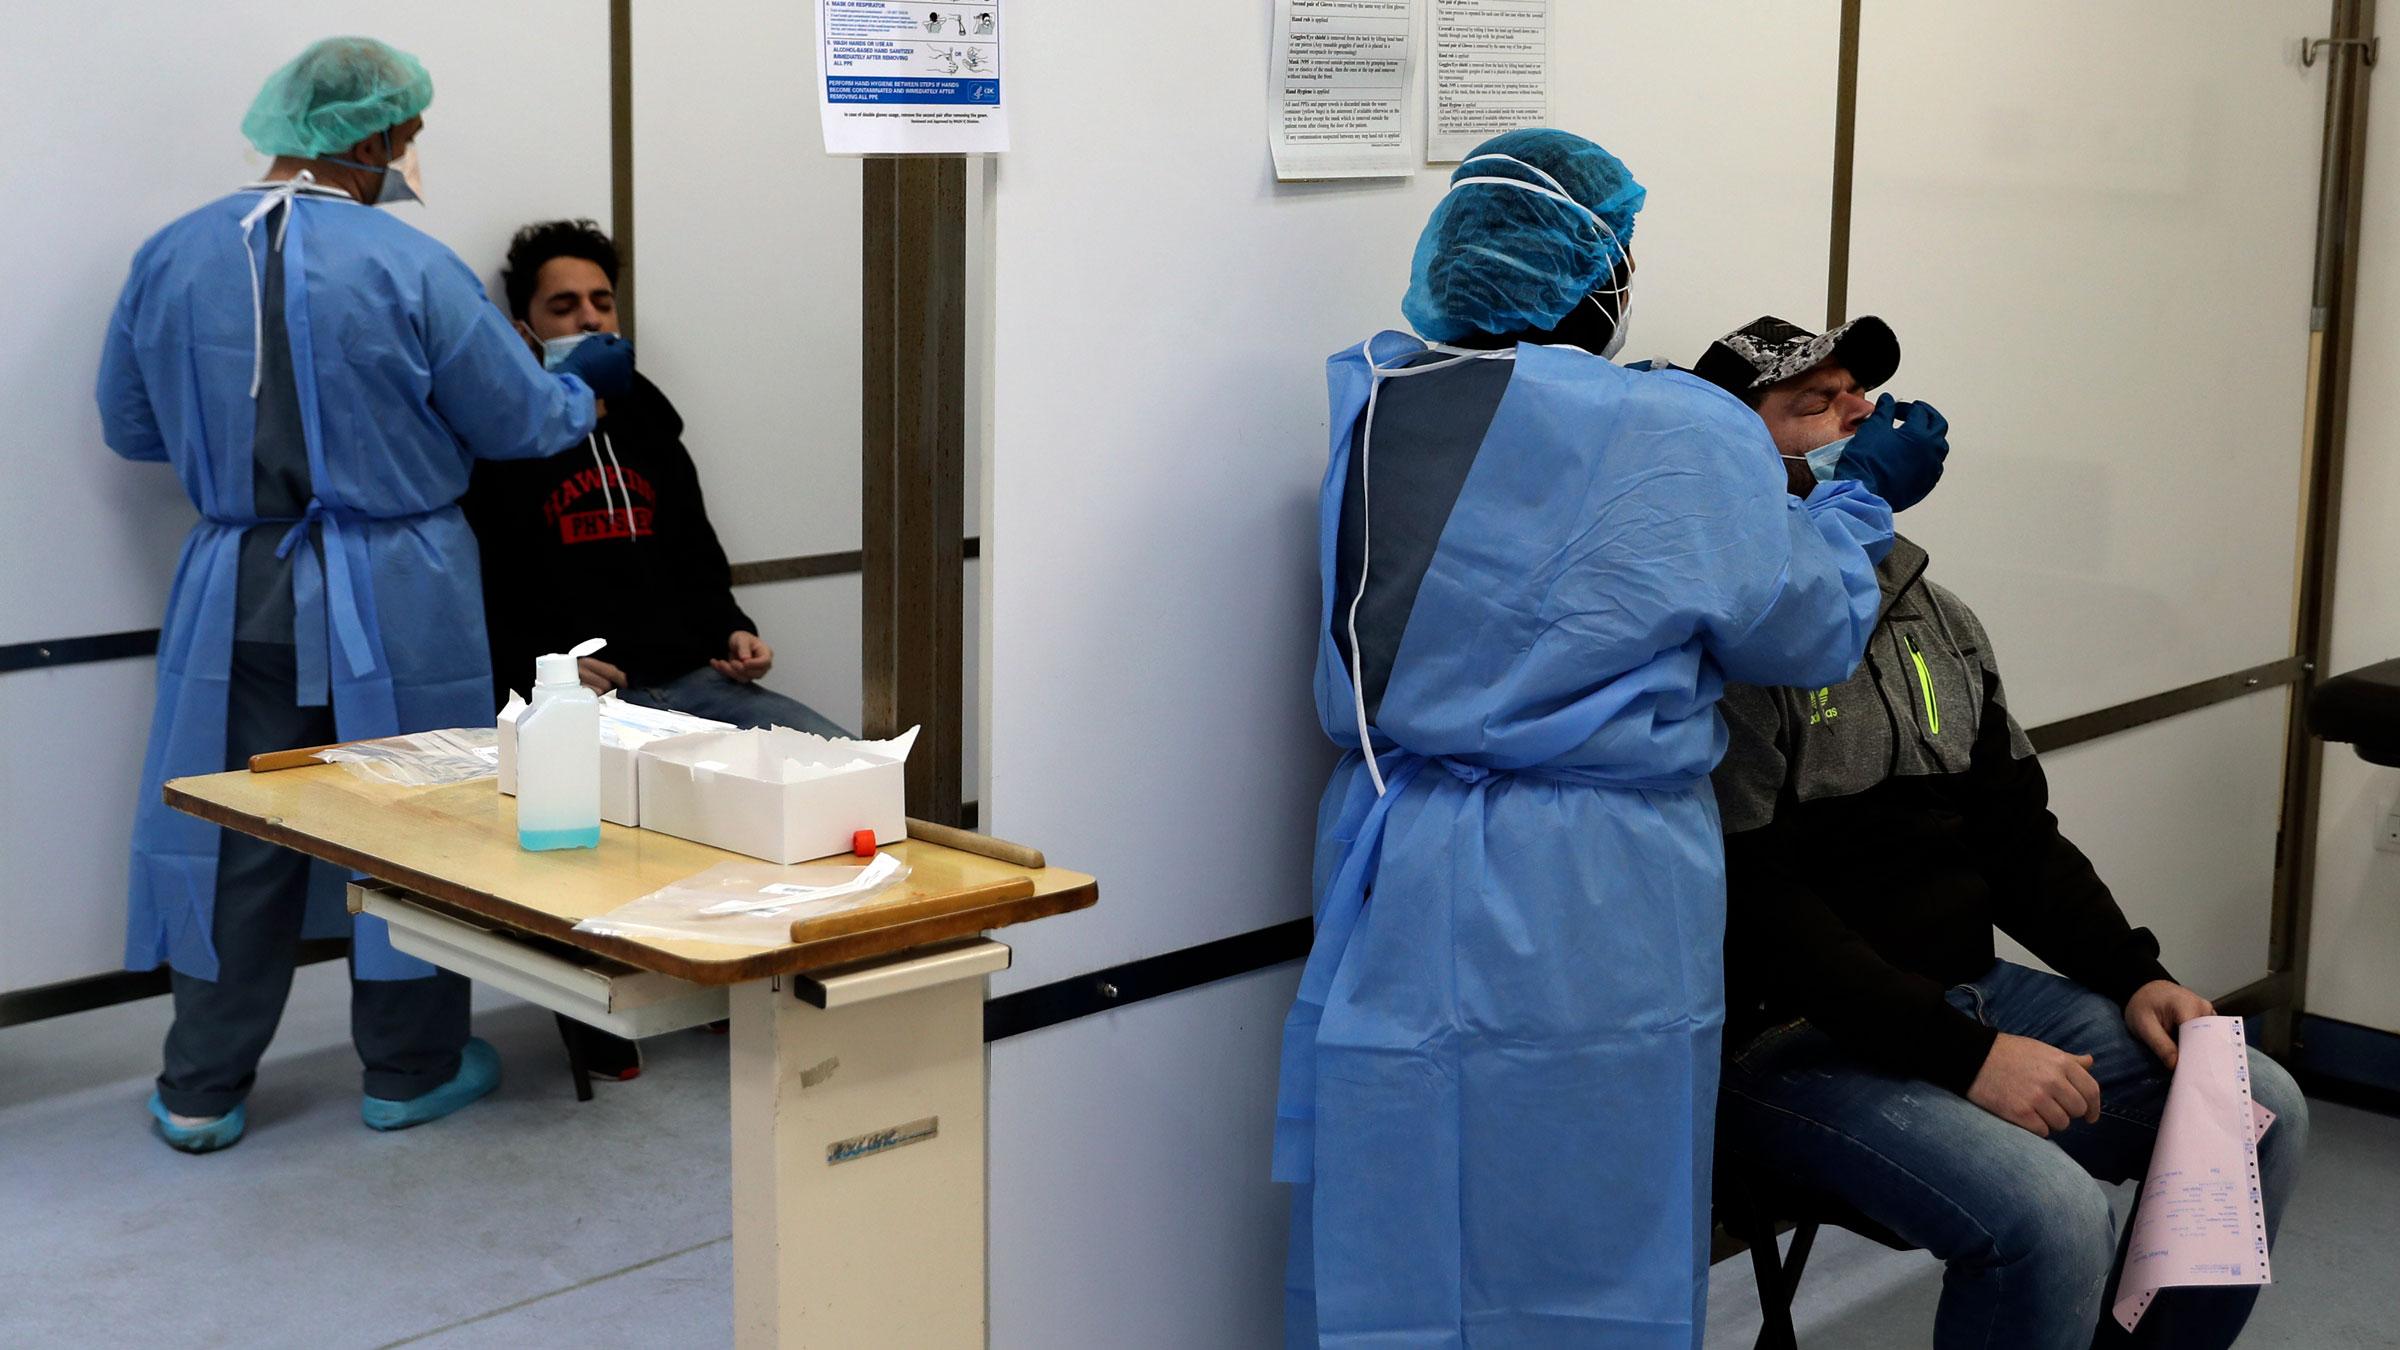 Medical staff test people for Covid-19 at the Rafik Hariri University Hospital in Beirut, Lebanon, on January 11.